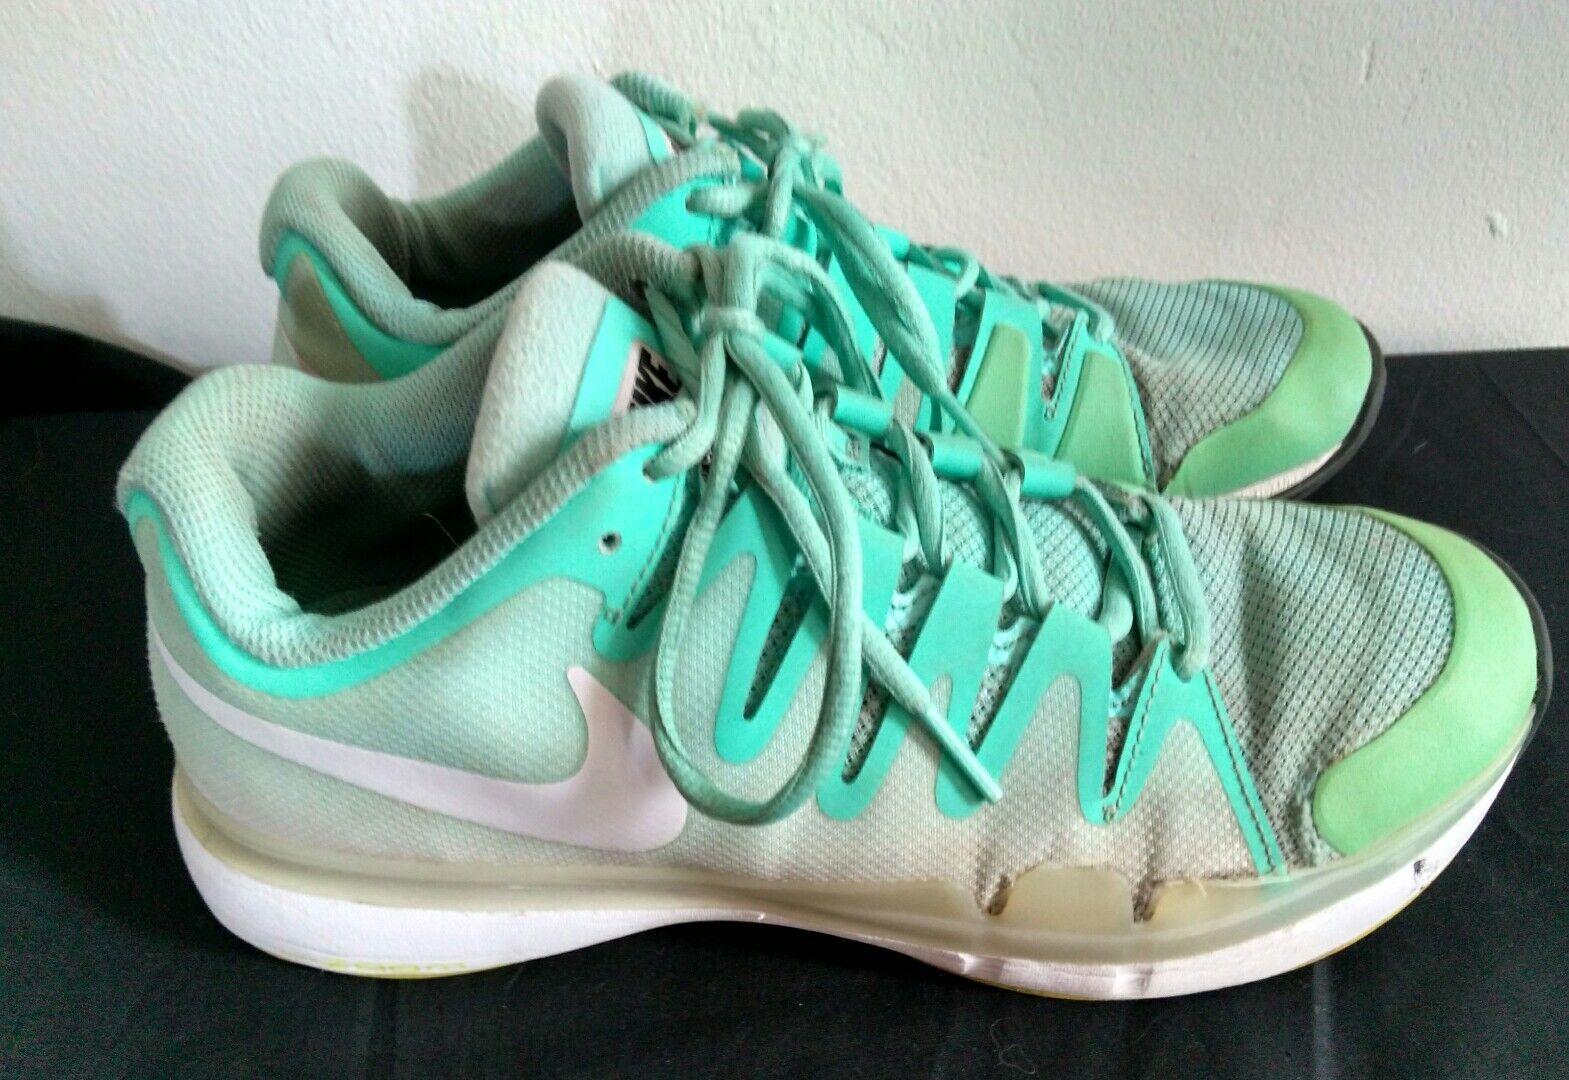 Women's Sz 8.5 NIKE Vapor 9.5 Tour Mint White Athletic Sneakers Shoes